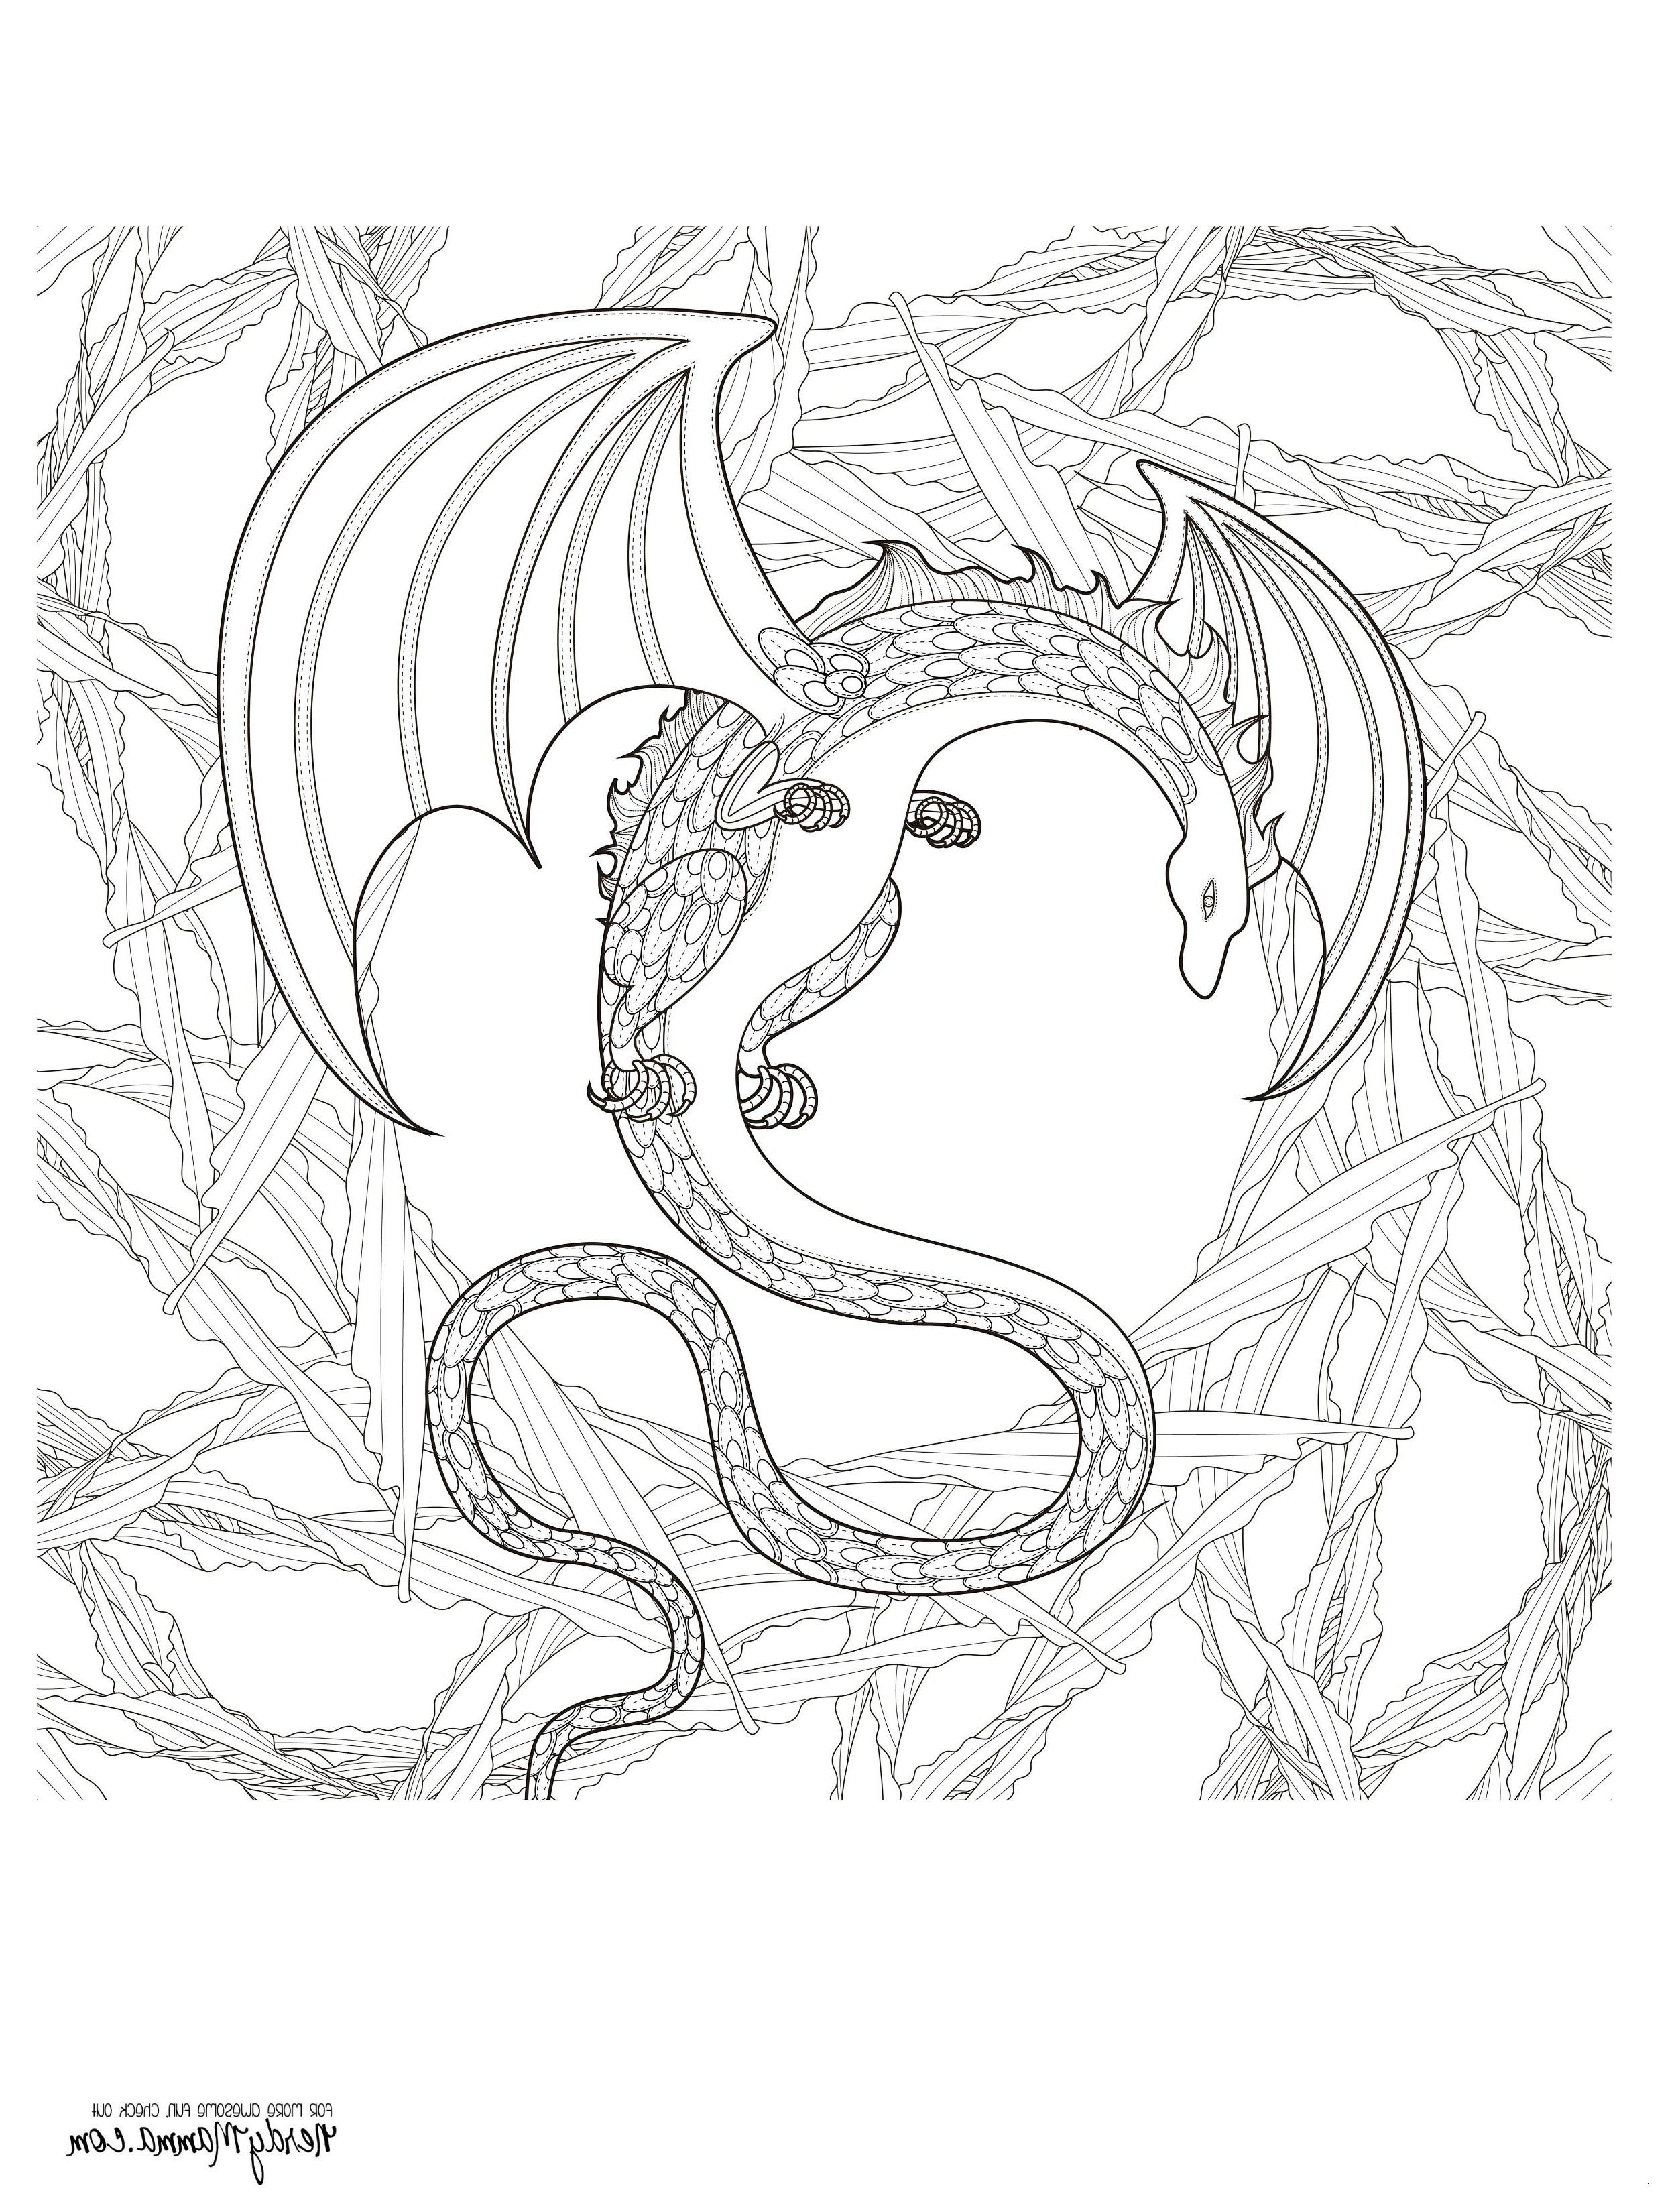 Ausmalbild Mandala Eule Inspirierend 34 Elegant Malvorlagen Mandala – Malvorlagen Ideen Sammlung